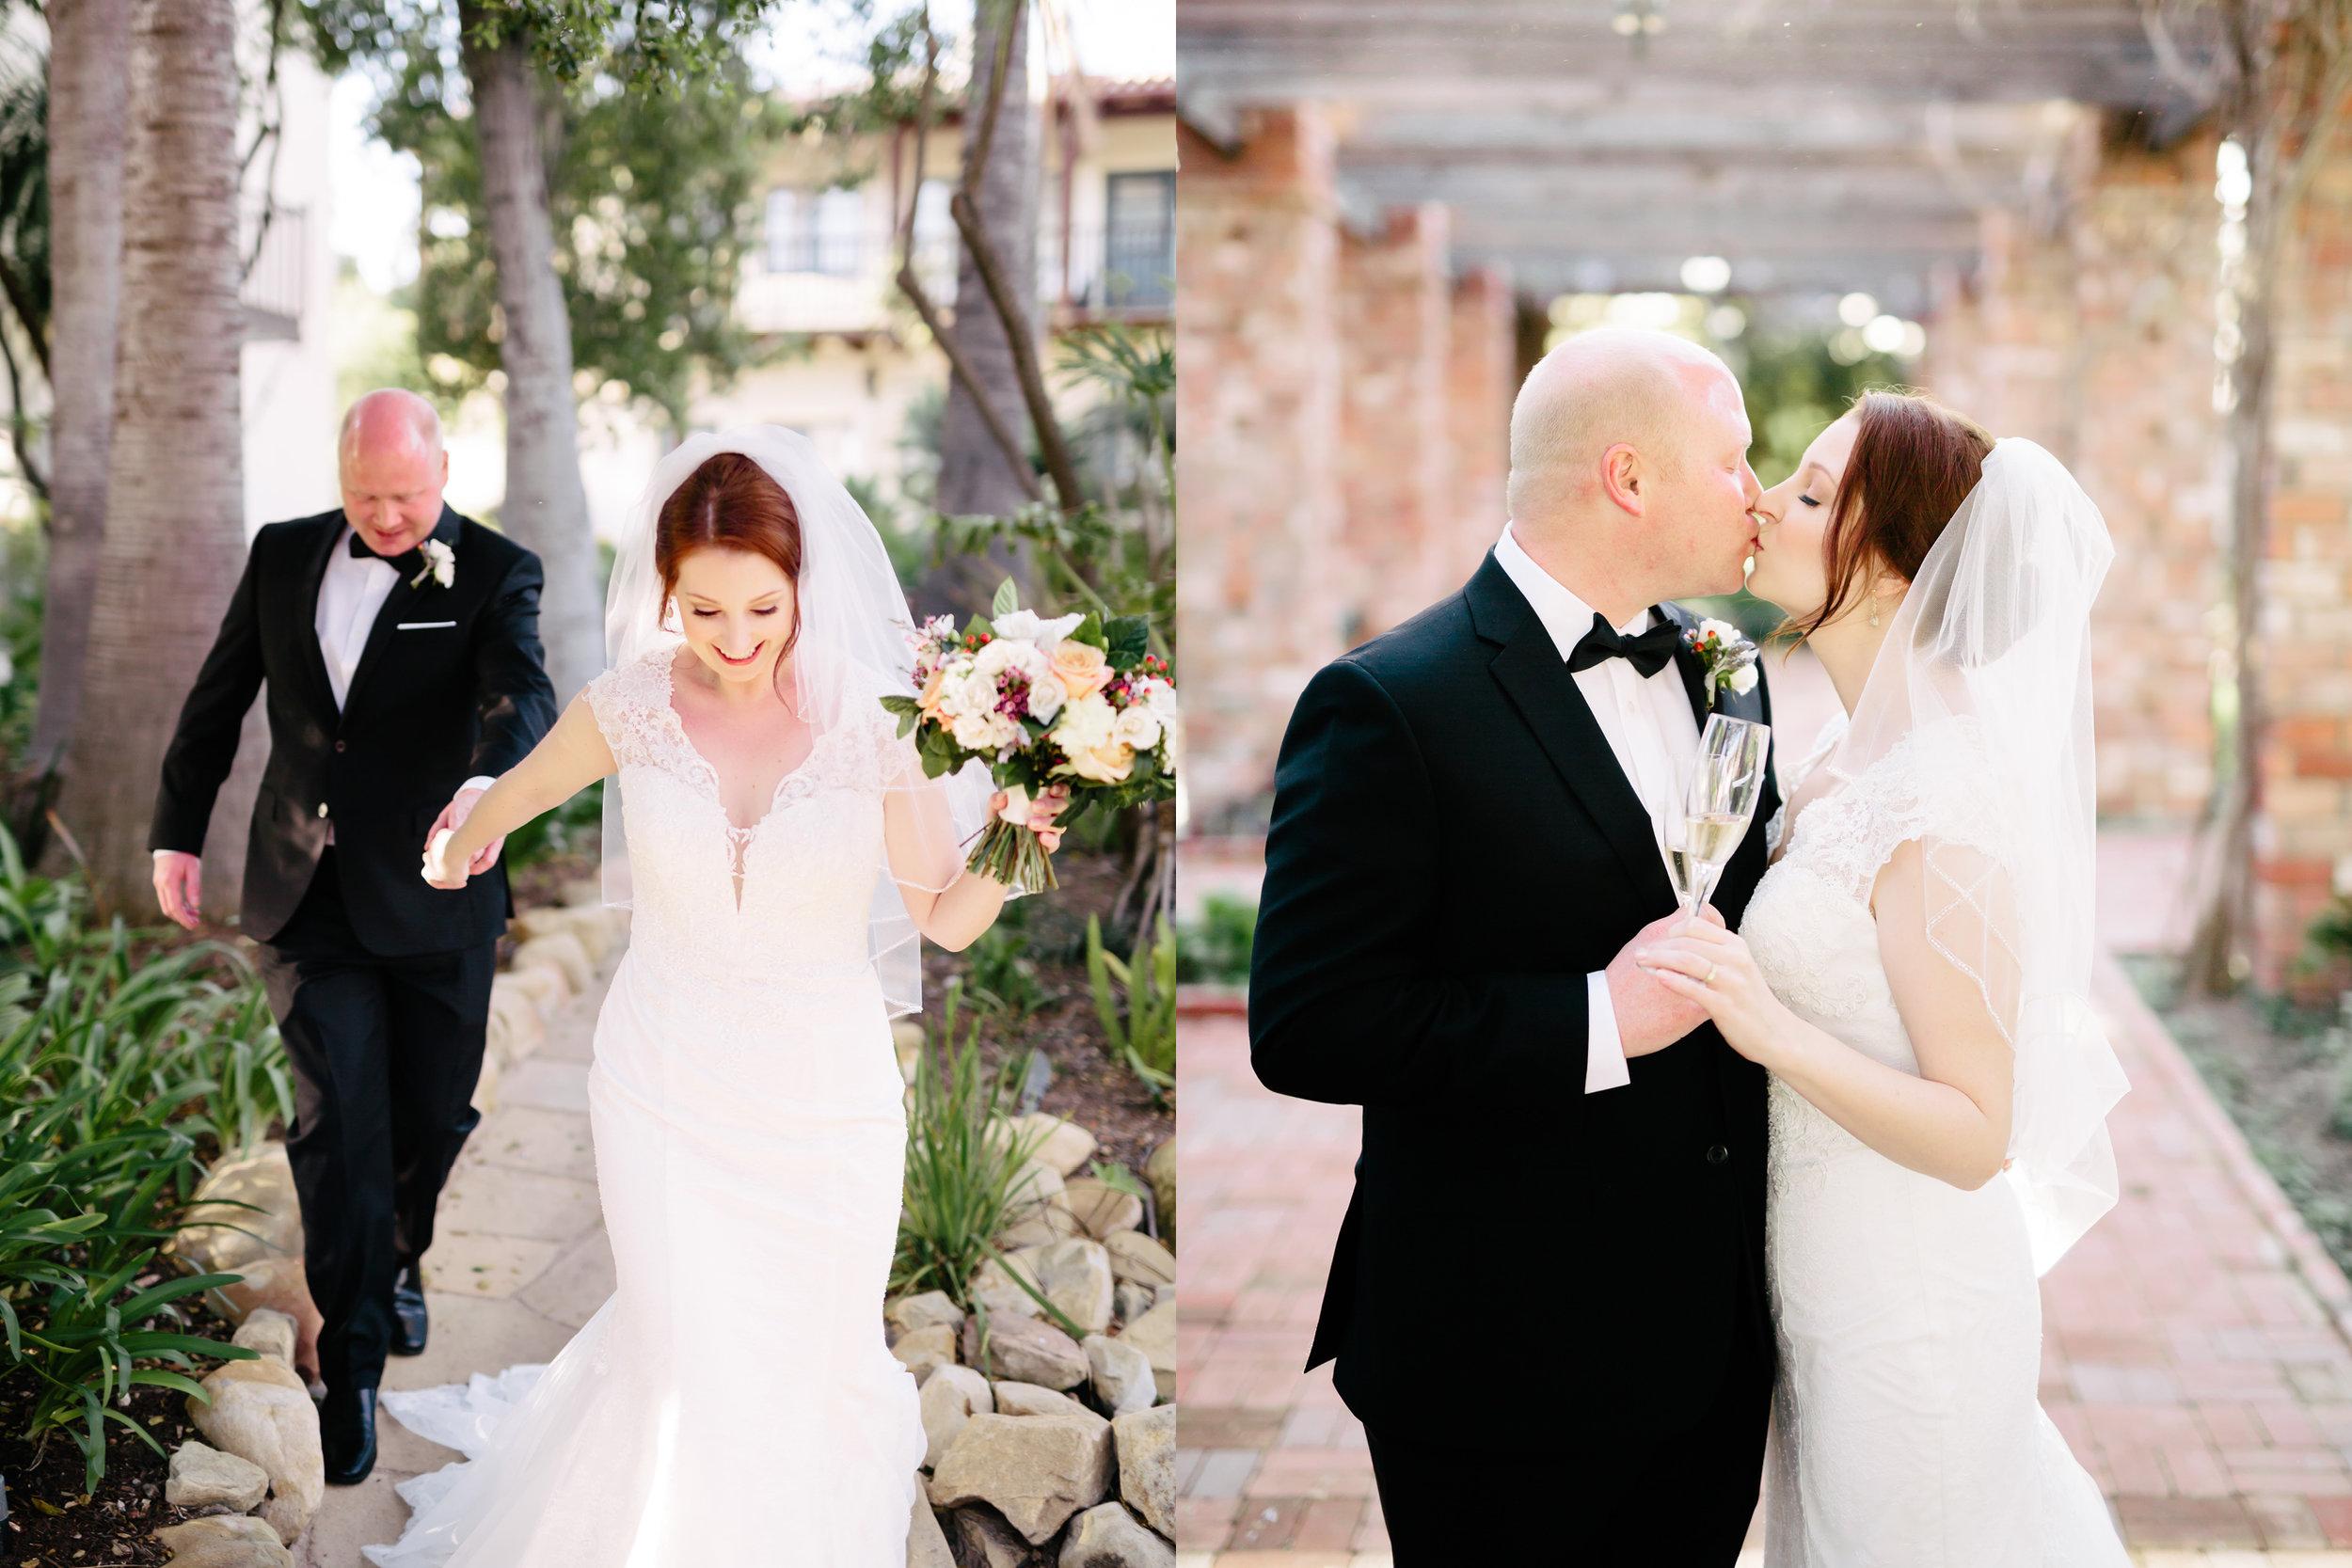 santa-barbara-elopement-wedding-planner-coordinator-day-of-el-encanto-belmond-resort-elope-lily-pond-black-tie-riviera (9).jpg